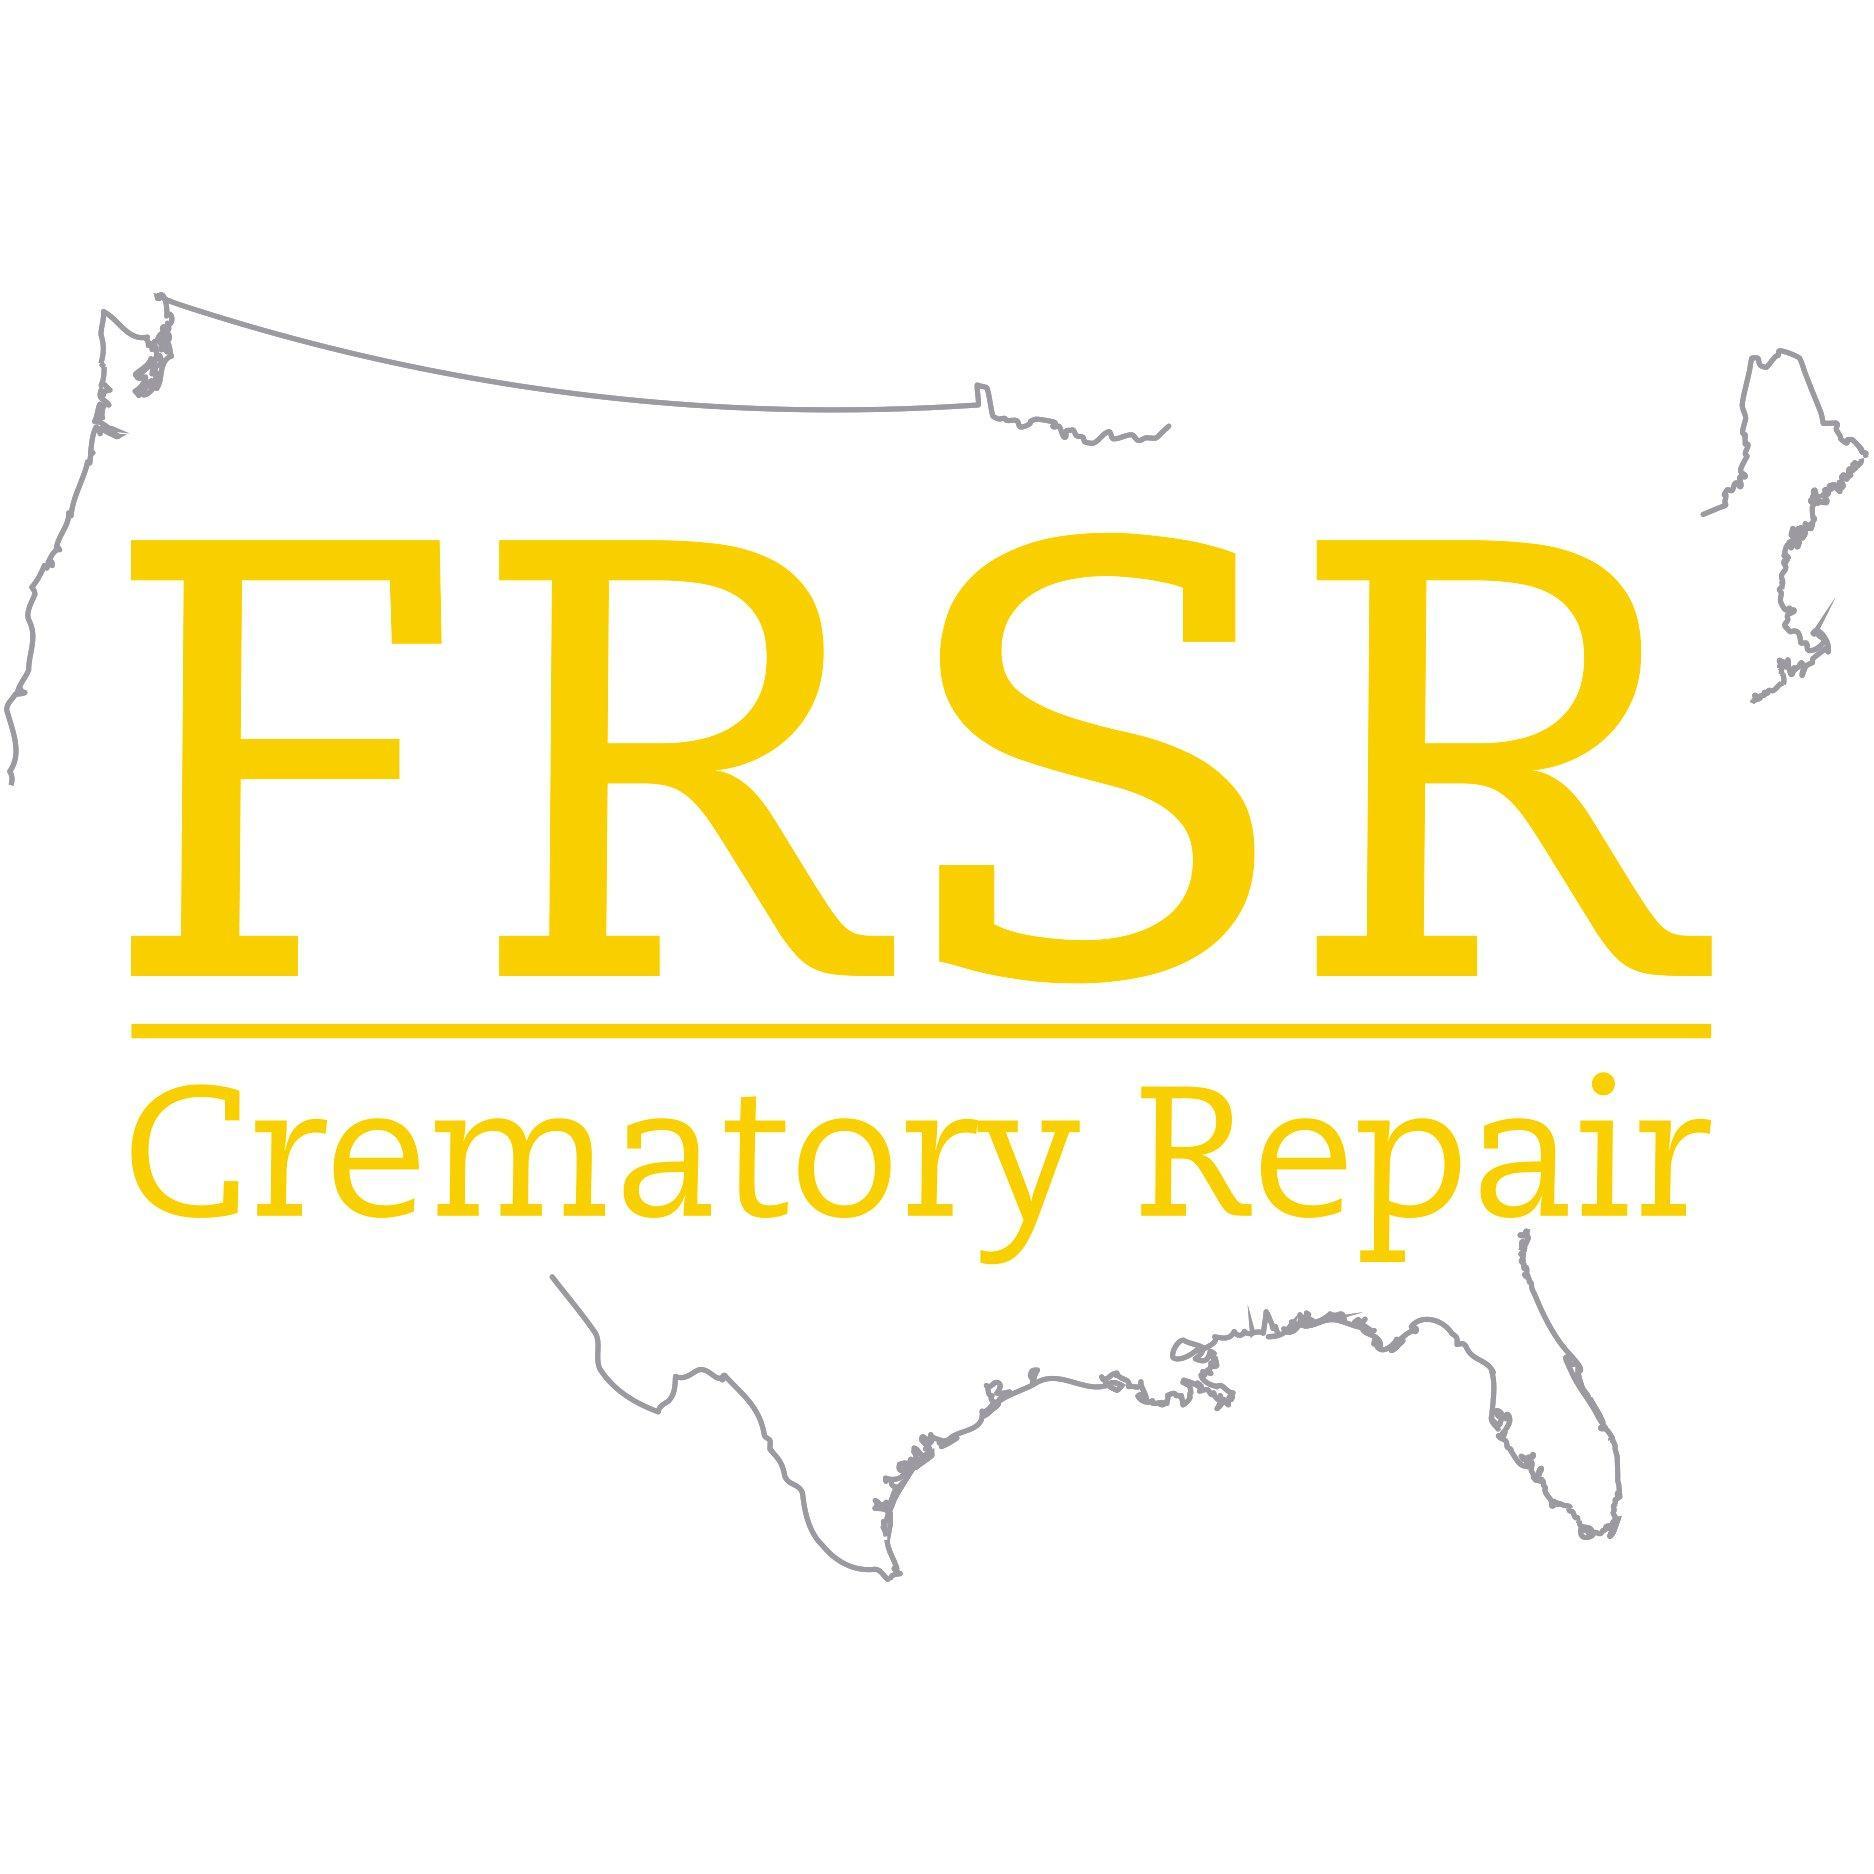 FRSR Crematory Repair Inc. - St. Paul, MN 55110 - (651)429-2537 | ShowMeLocal.com